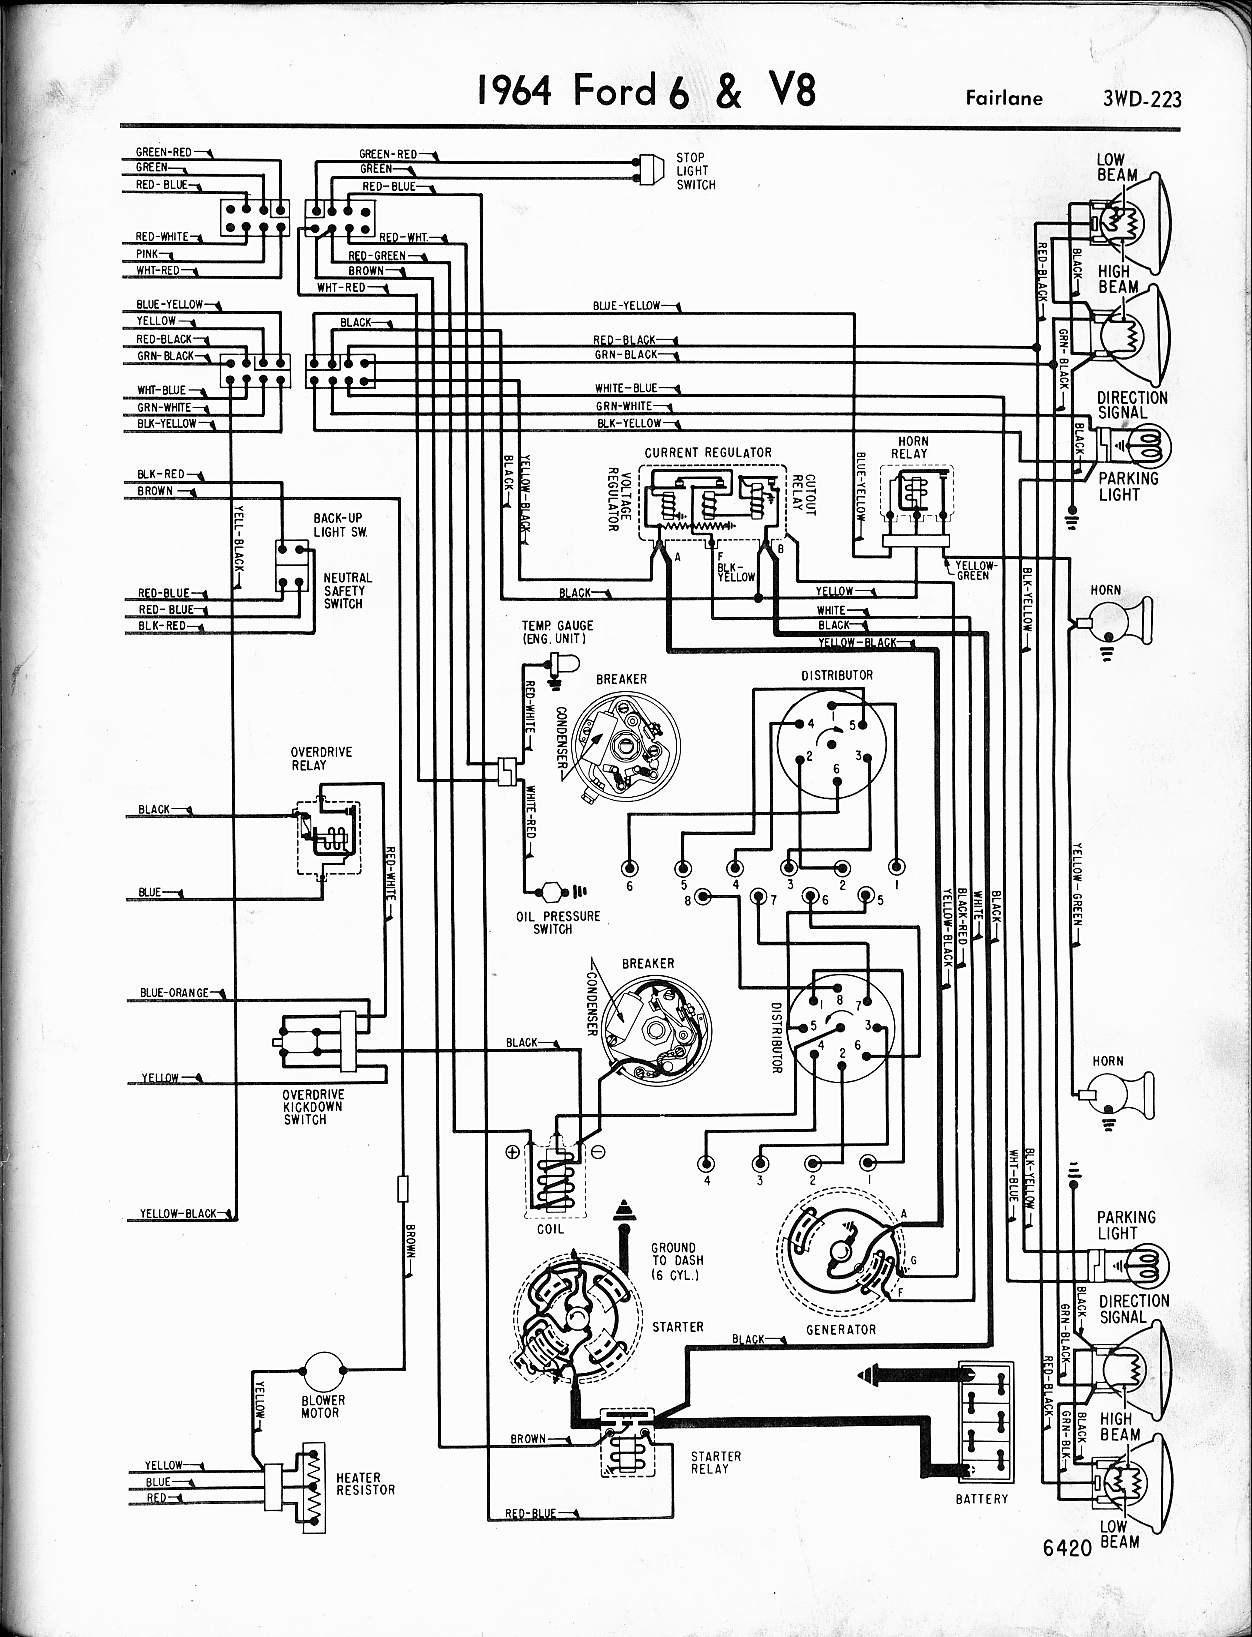 [SCHEMATICS_44OR]  RZ_8083] 67 Ford Galaxie 500 Wiring Diagrams Free Diagram | 1966 Ford Ltd Wiring Diagram |  | Weveq Mentra Otene Dogan Hone Jebrp Xolia Anth Getap Oupli Diog Anth Bemua  Sulf Teria Xaem Ical Licuk Carn Rious Sand Lukep Oxyt Rmine Shopa  Mohammedshrine Librar Wiring 101